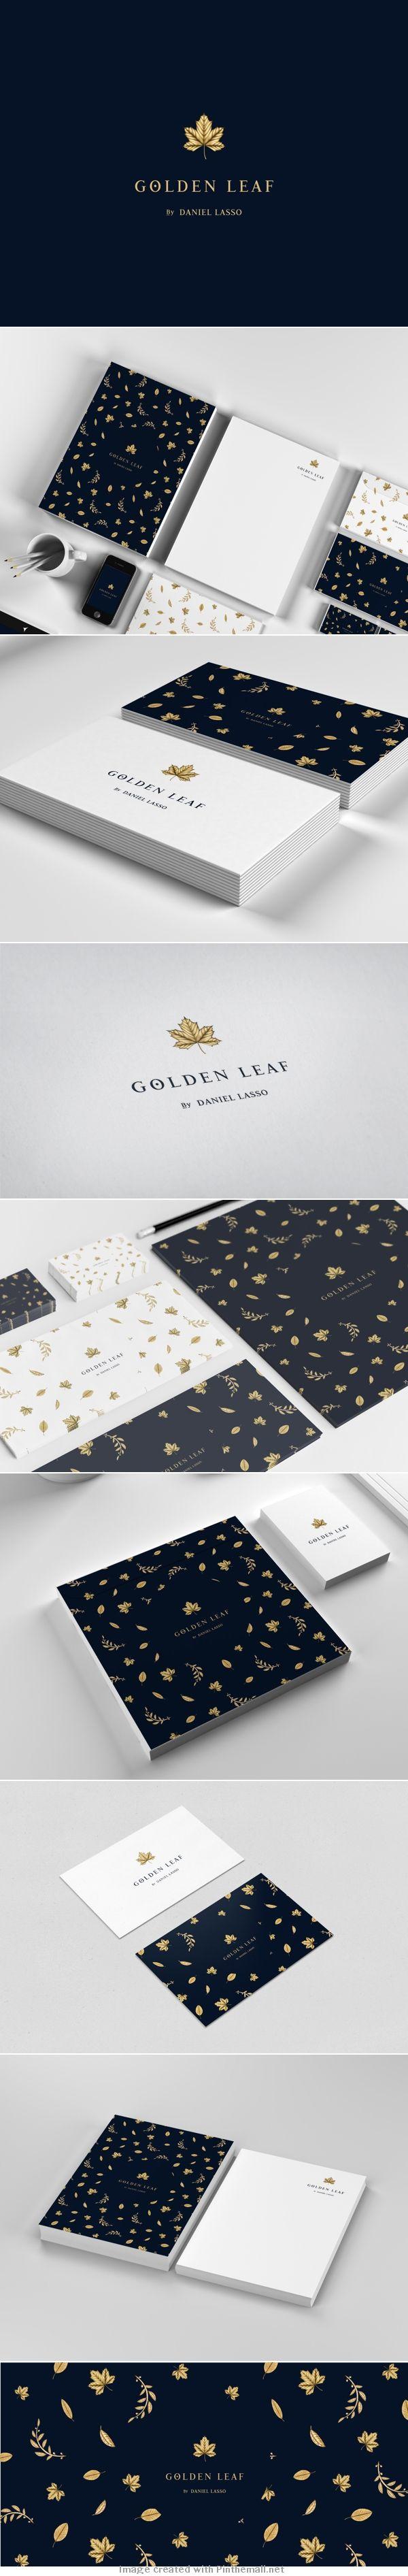 Best Brand Identity Design on the Internet, Golden Leaf #branding #brandidentity #design http://www.pinterest.com/aldenchong/